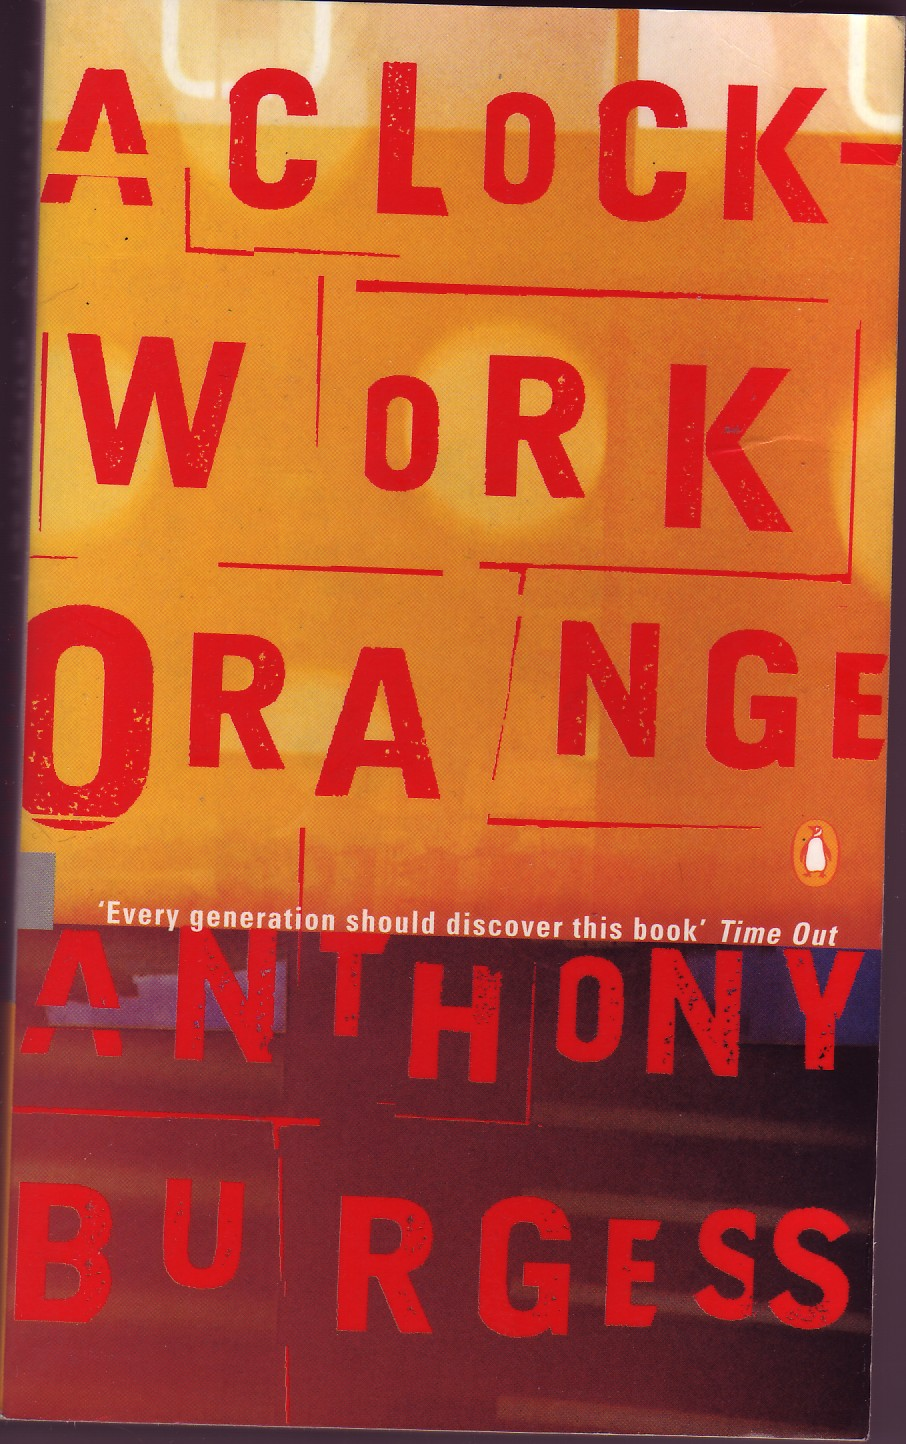 [clockwork+orange]